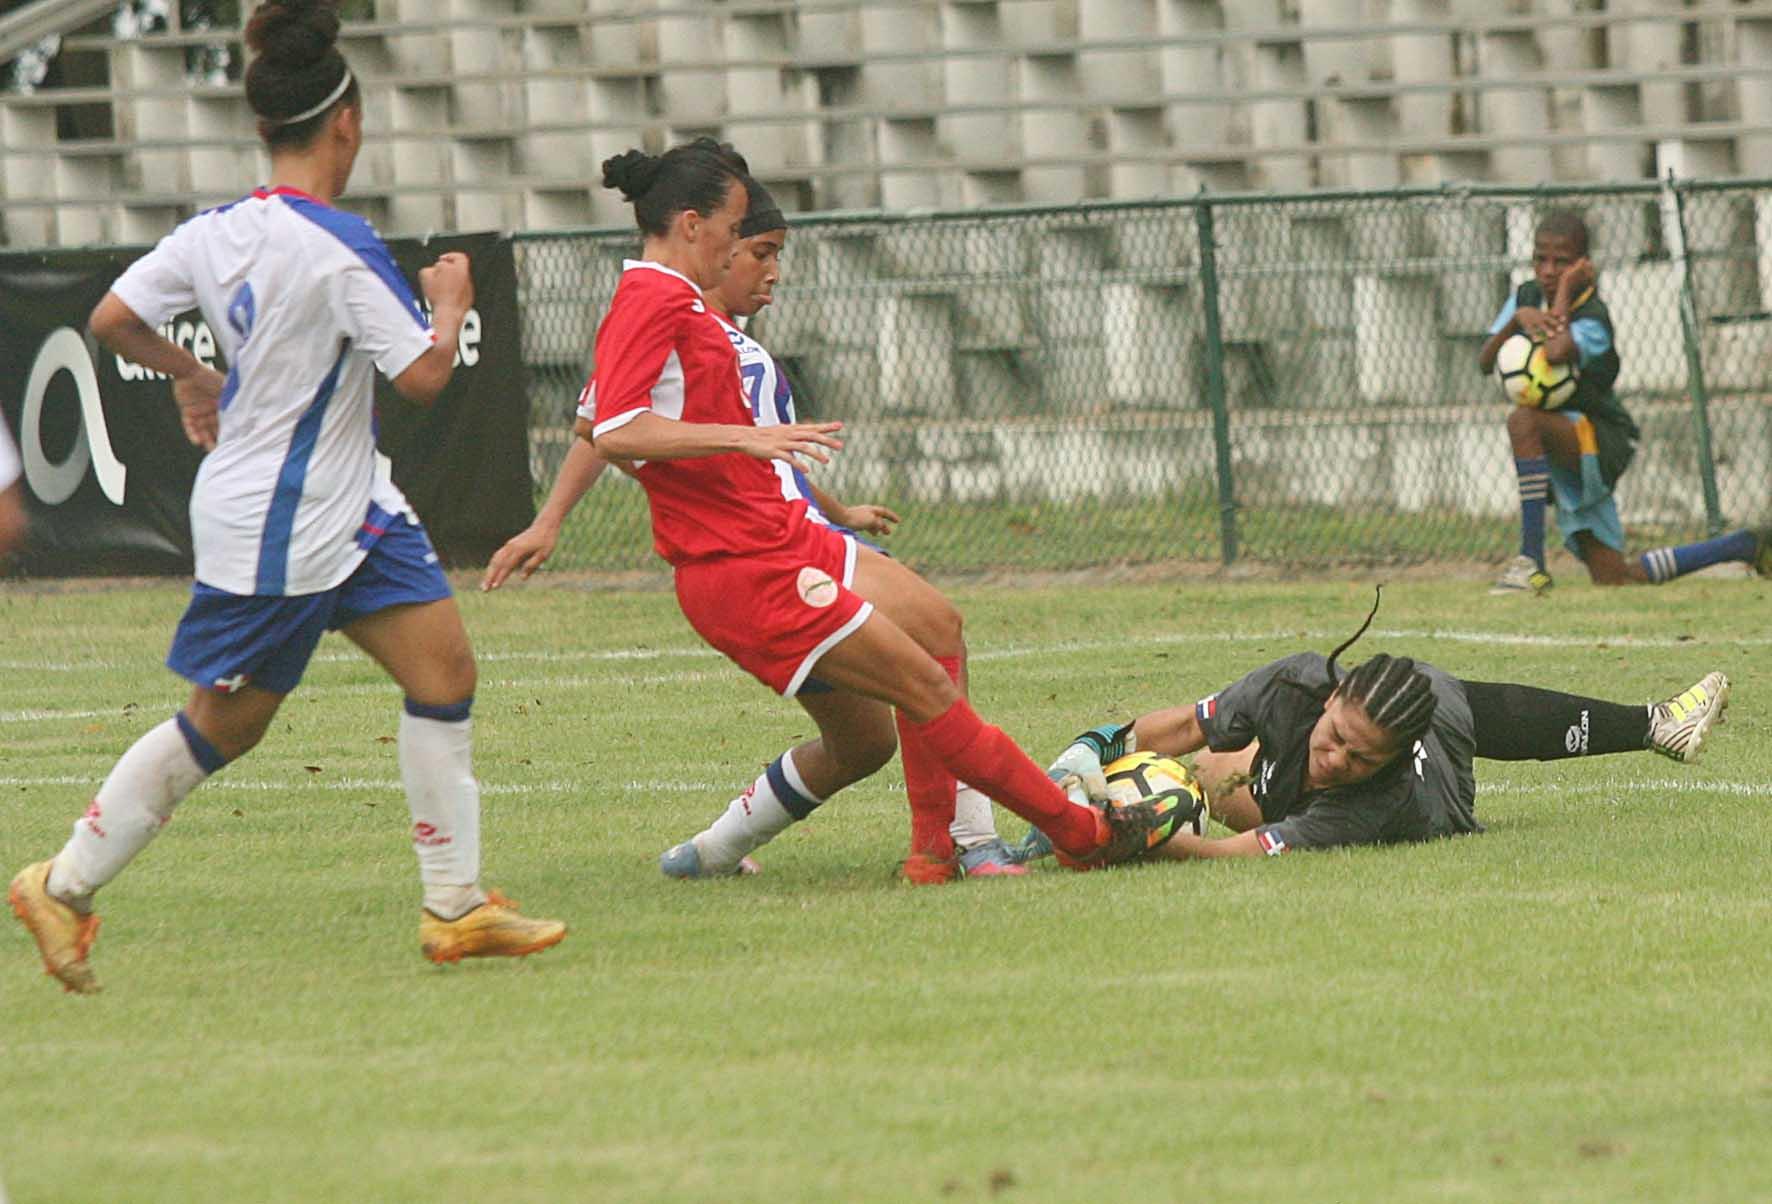 Dominicana se lo juega todo ante Aruba tras caer frente a Cuba rumbo al Mundial Femenino